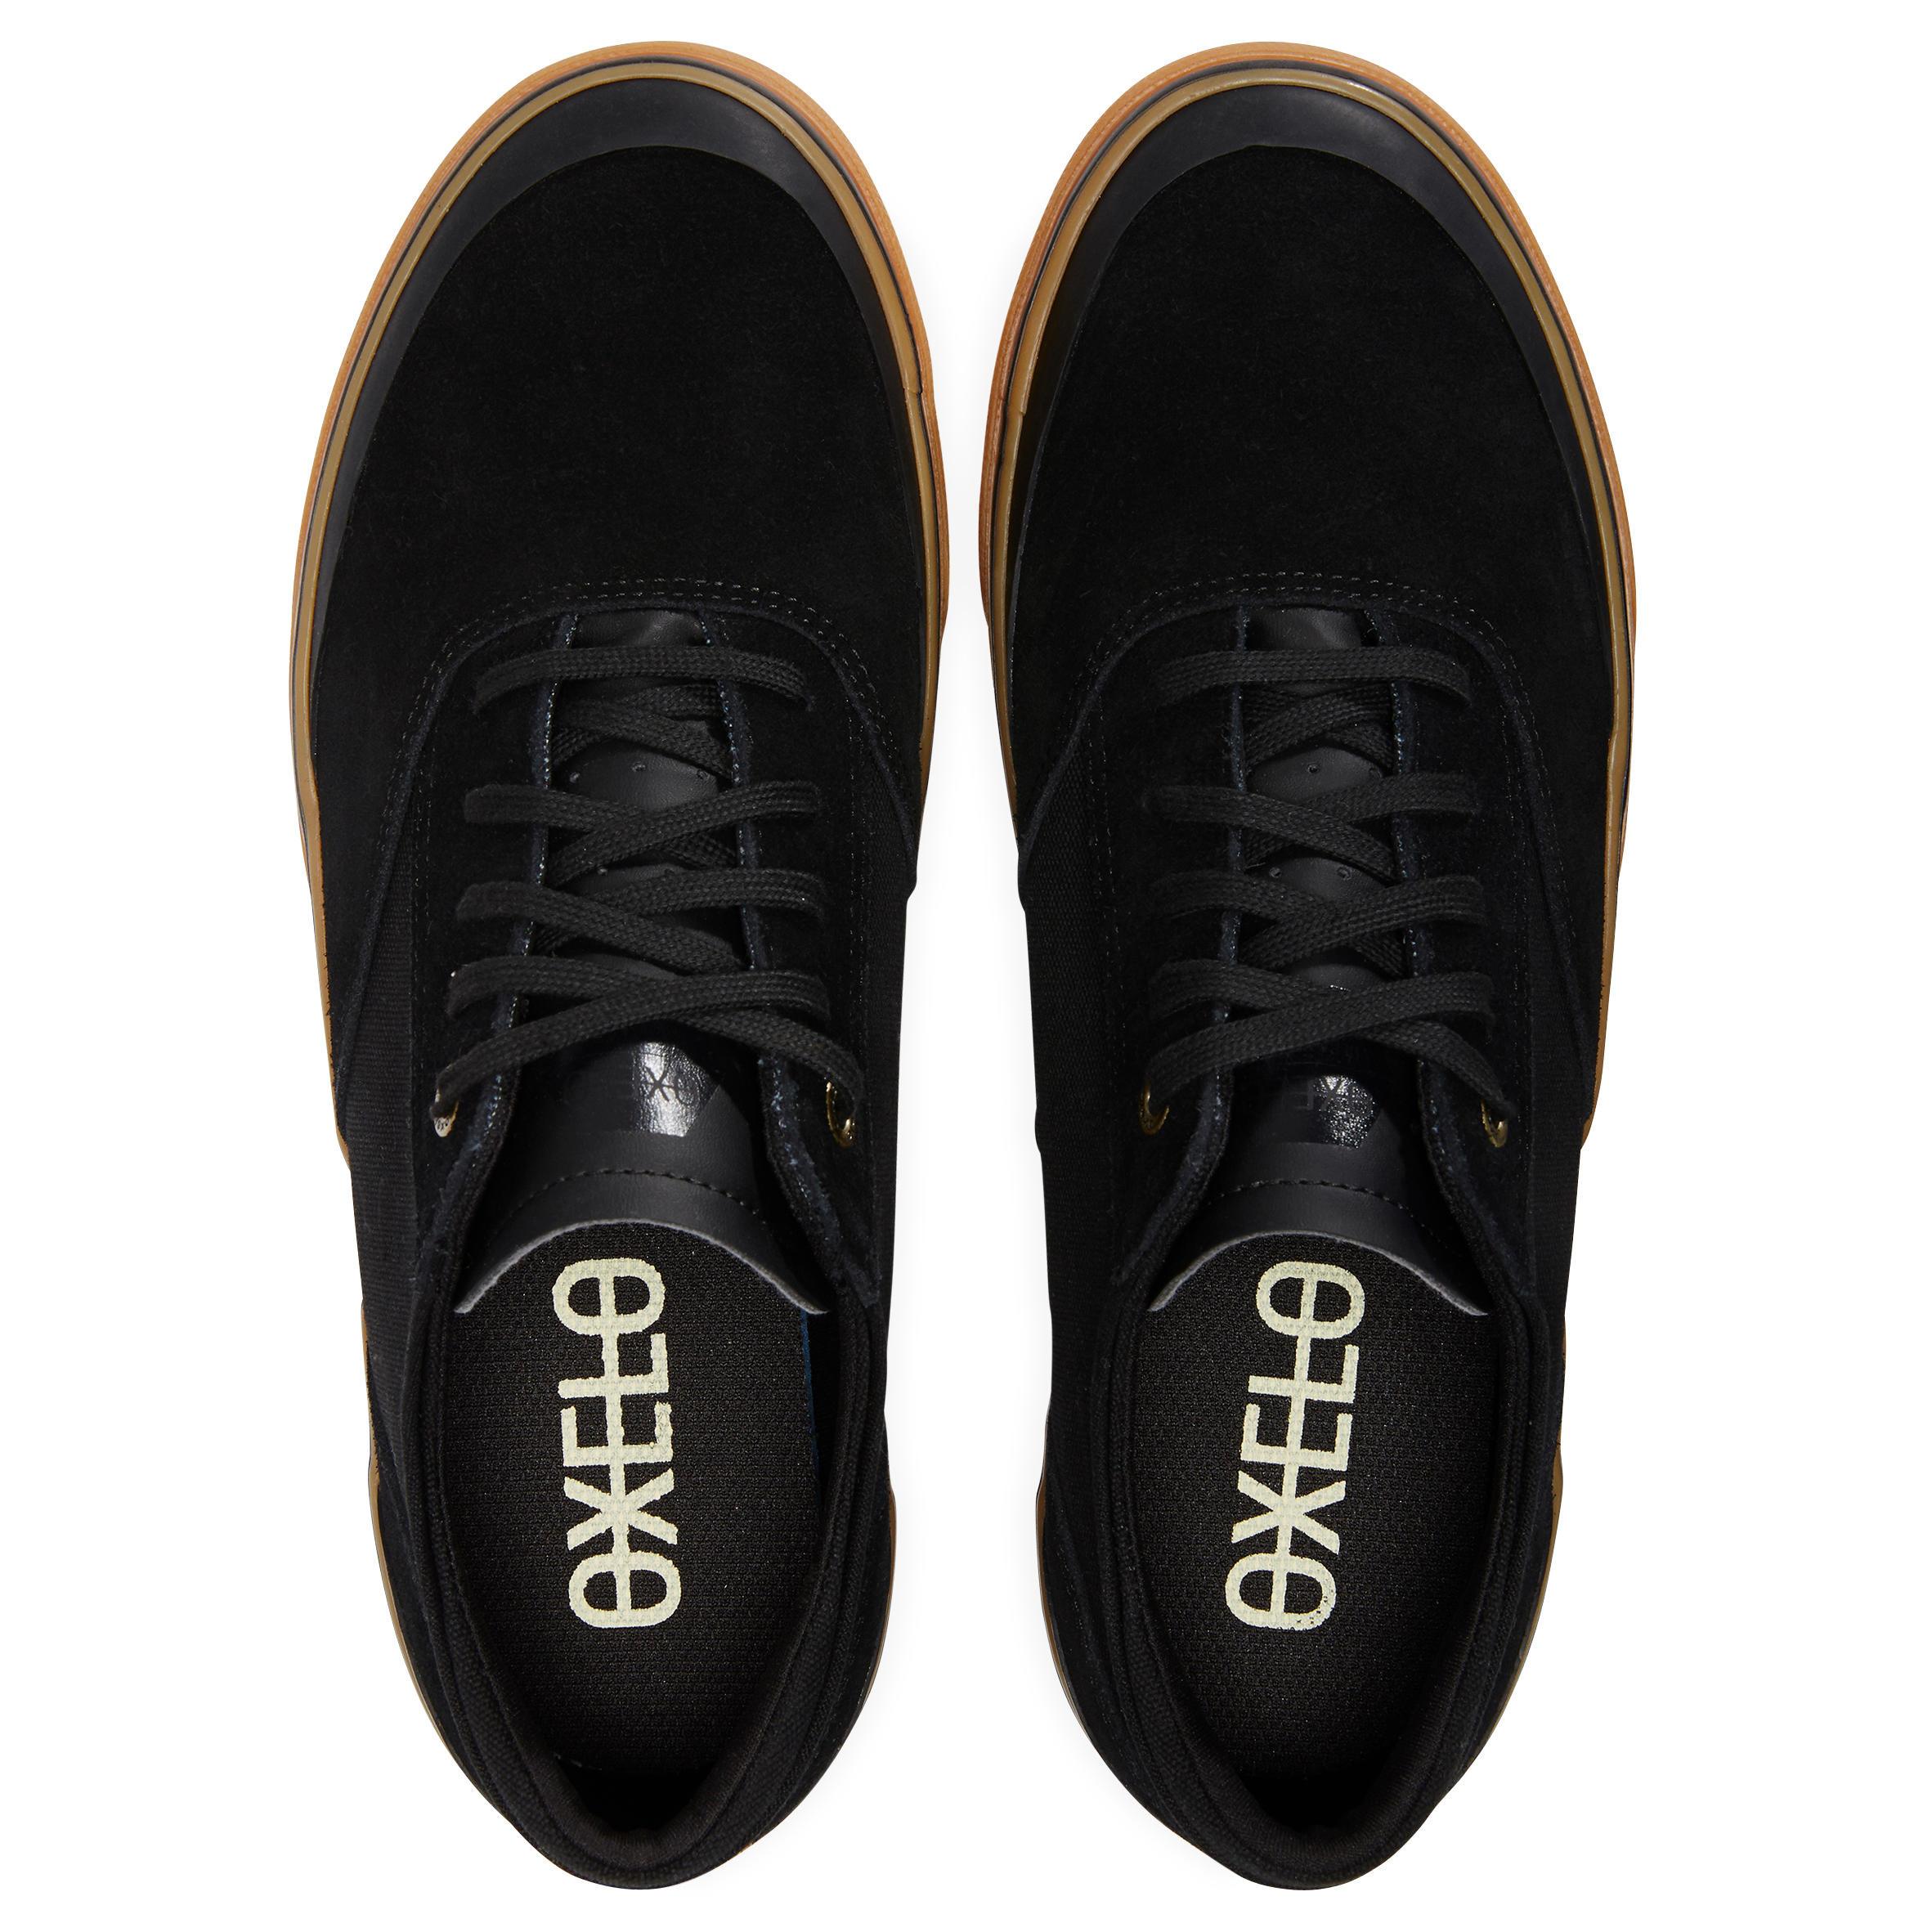 Vulca 500 Adult Low-Top Skate Shoes